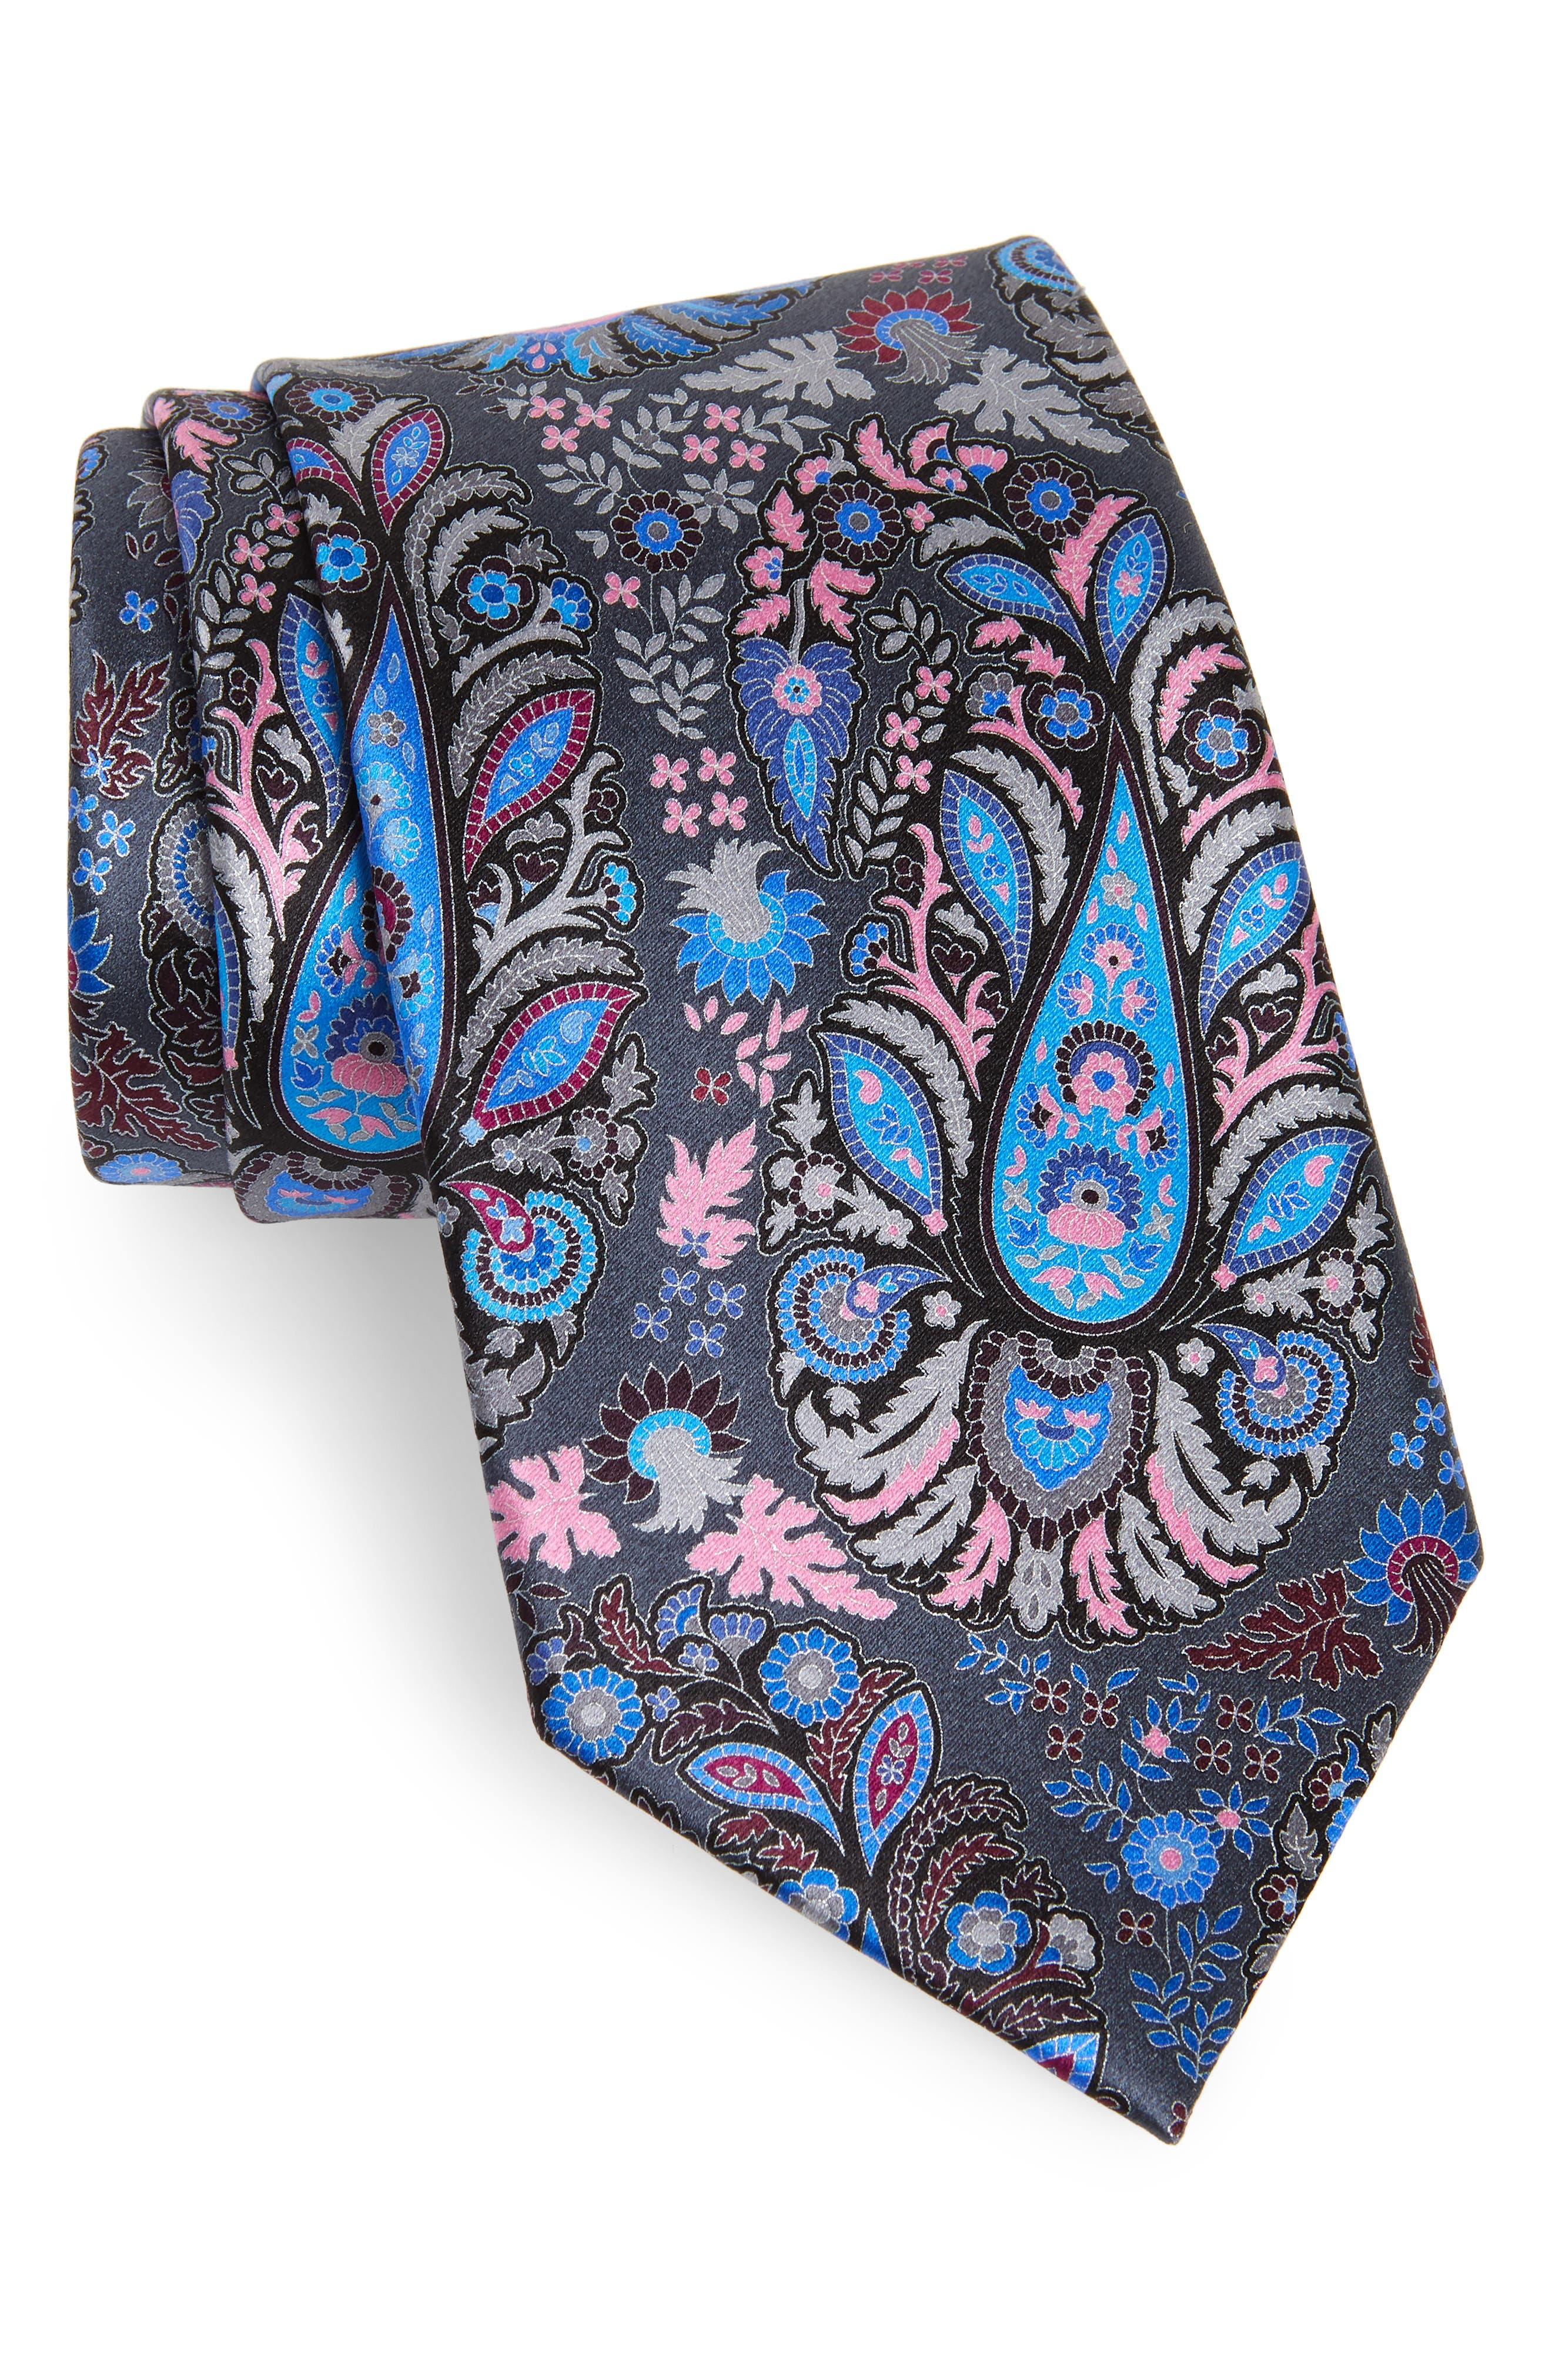 Quindici + Quindici Paisley Silk Tie,                             Main thumbnail 1, color,                             BLACK/ BLUE